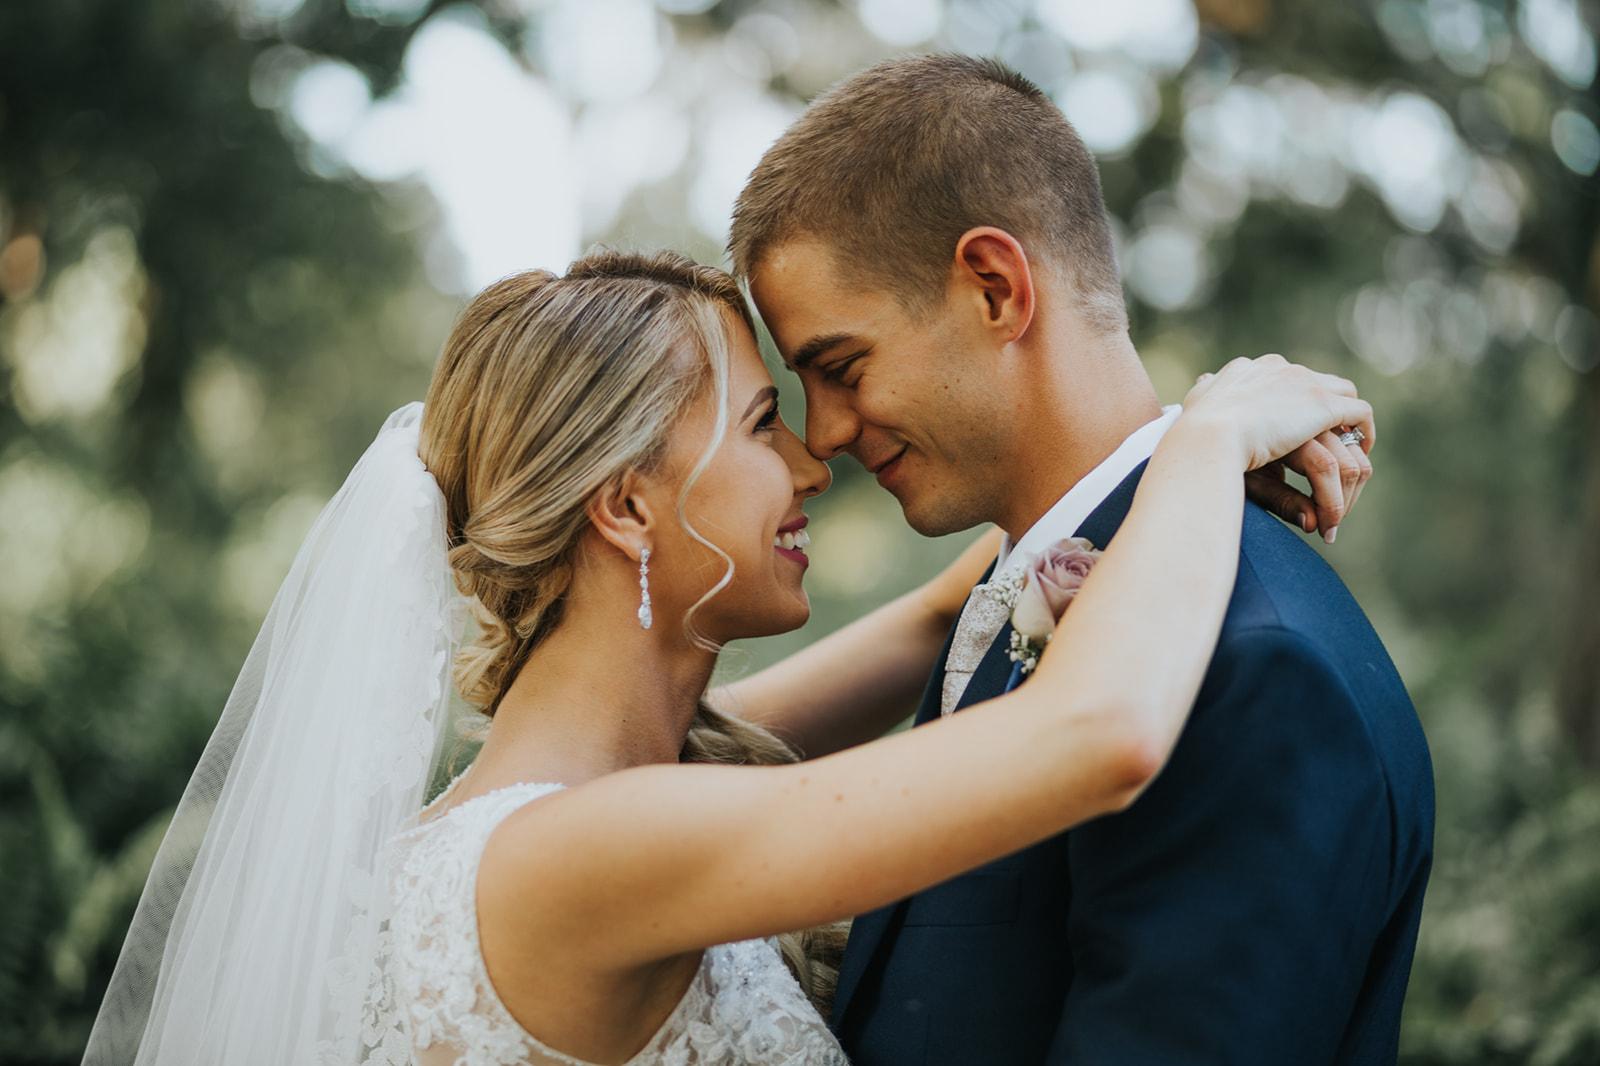 323Sean_Emily_Wedding_3-30-19_websize.jpg